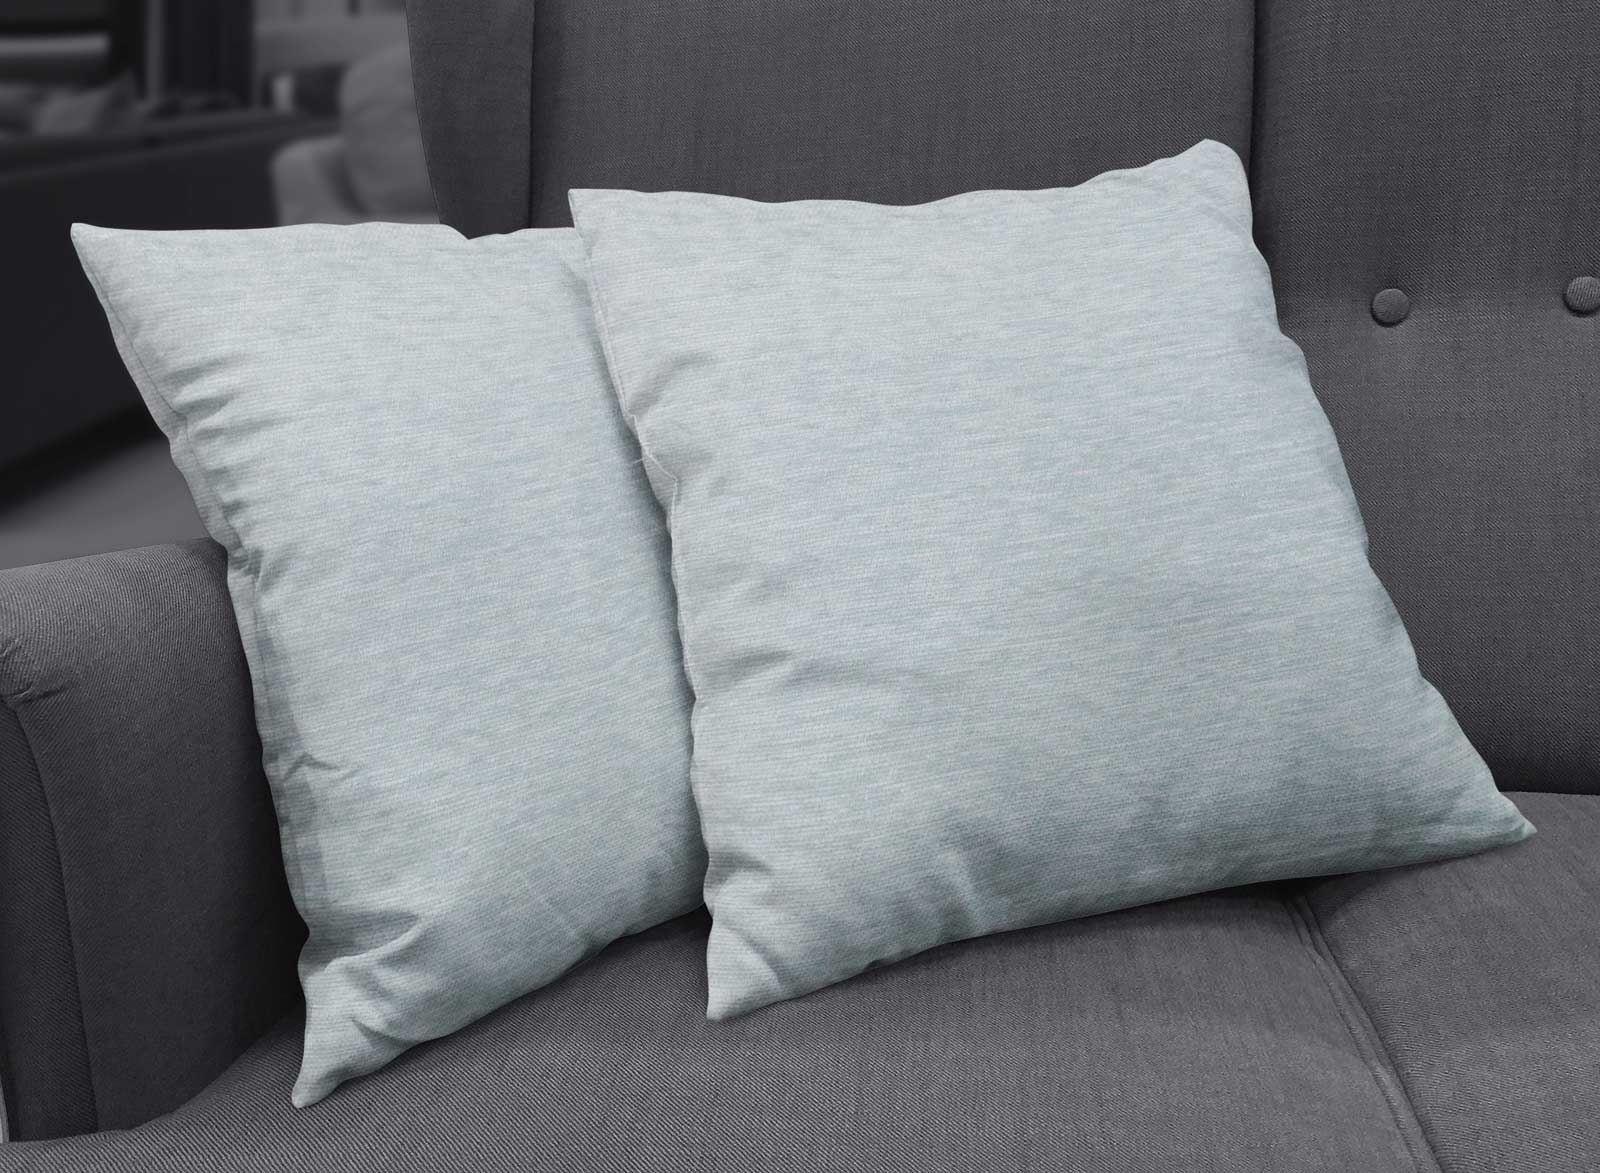 Set-of-2-Chenille-Cushion-Covers-Luxury-Plain-Cushions-Cover-Pairs-18-034-x-18-034 thumbnail 31